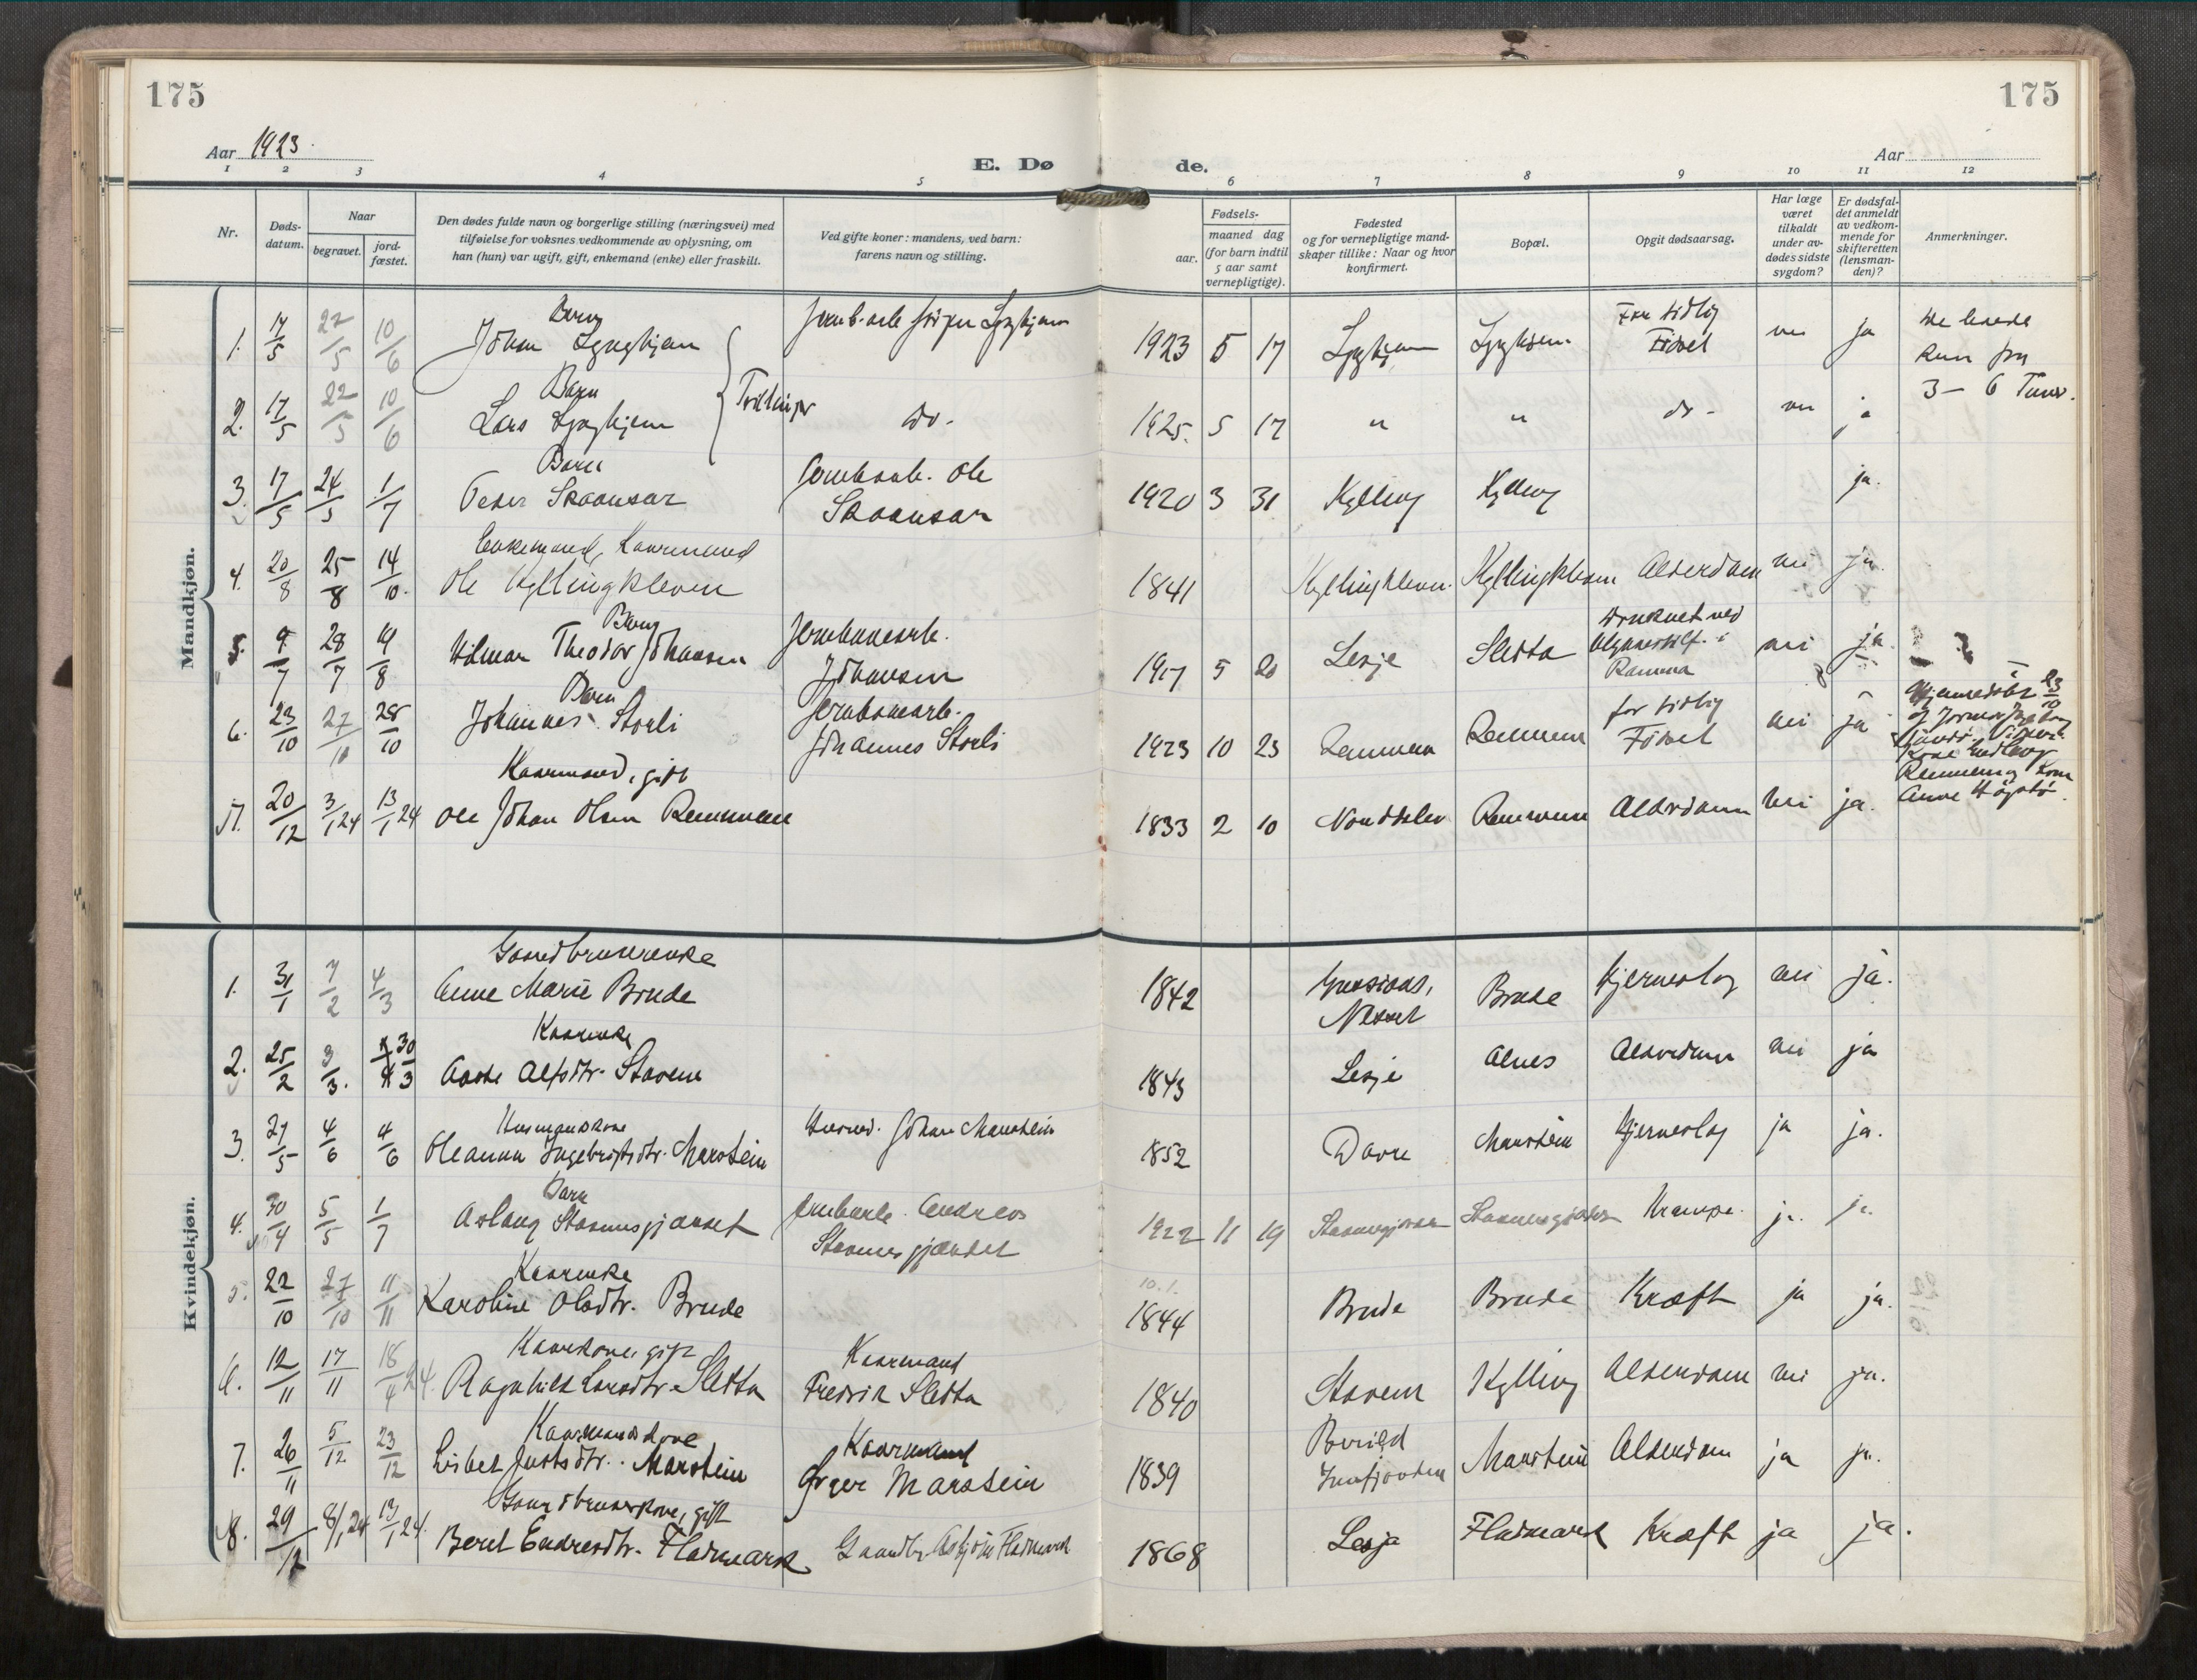 SAT, Grytten sokneprestkontor, Ministerialbok nr. 546A04, 1919-1956, s. 175